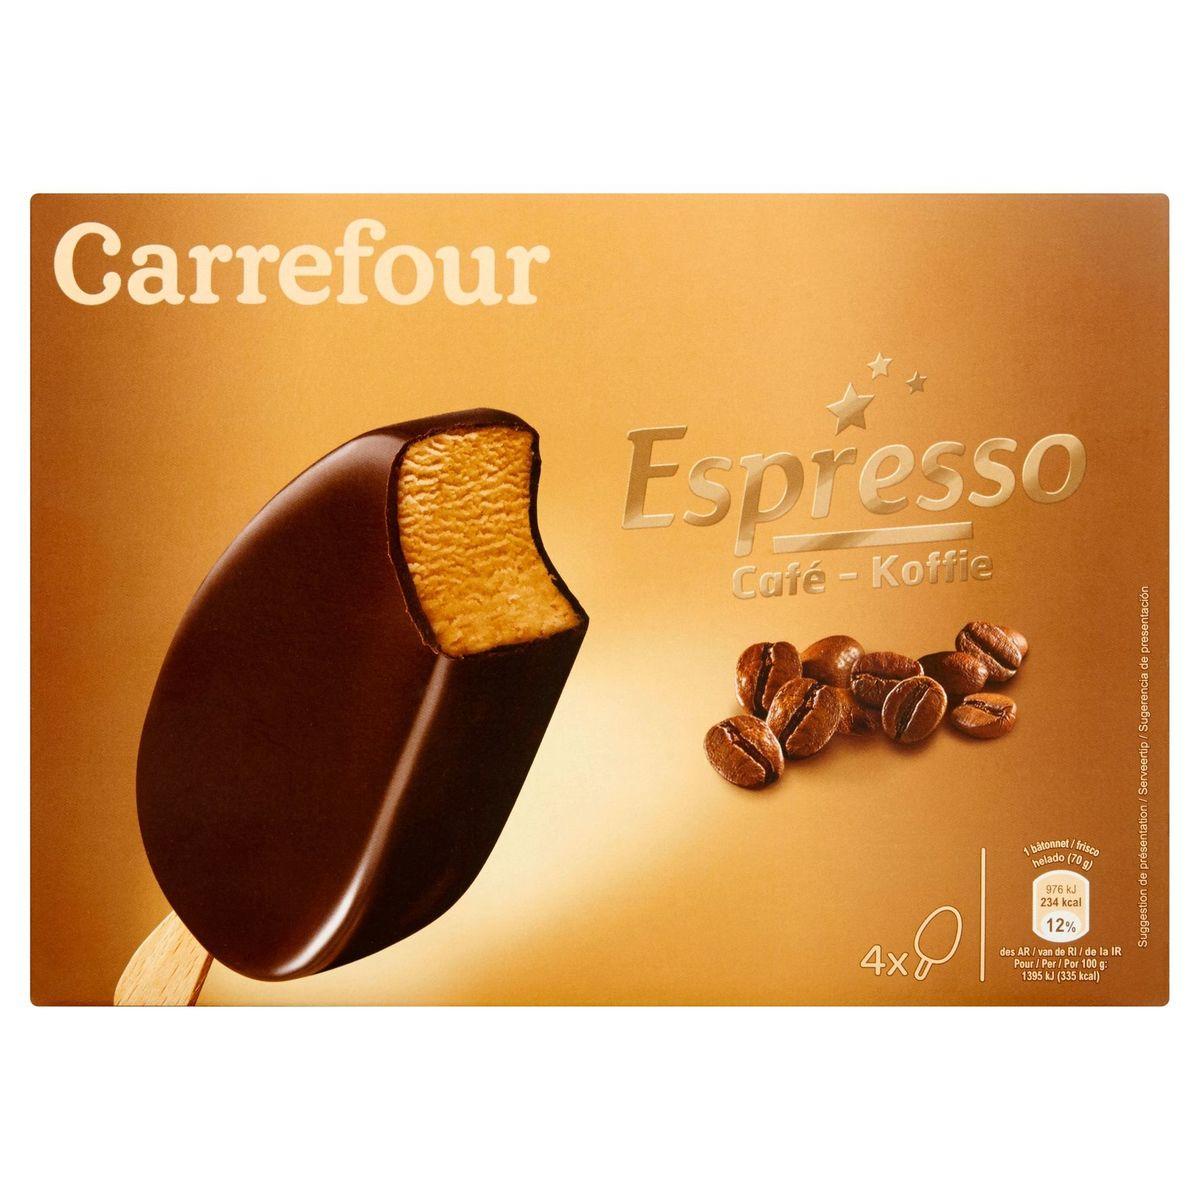 Carrefour Espresso Koffie 4 x 70 g